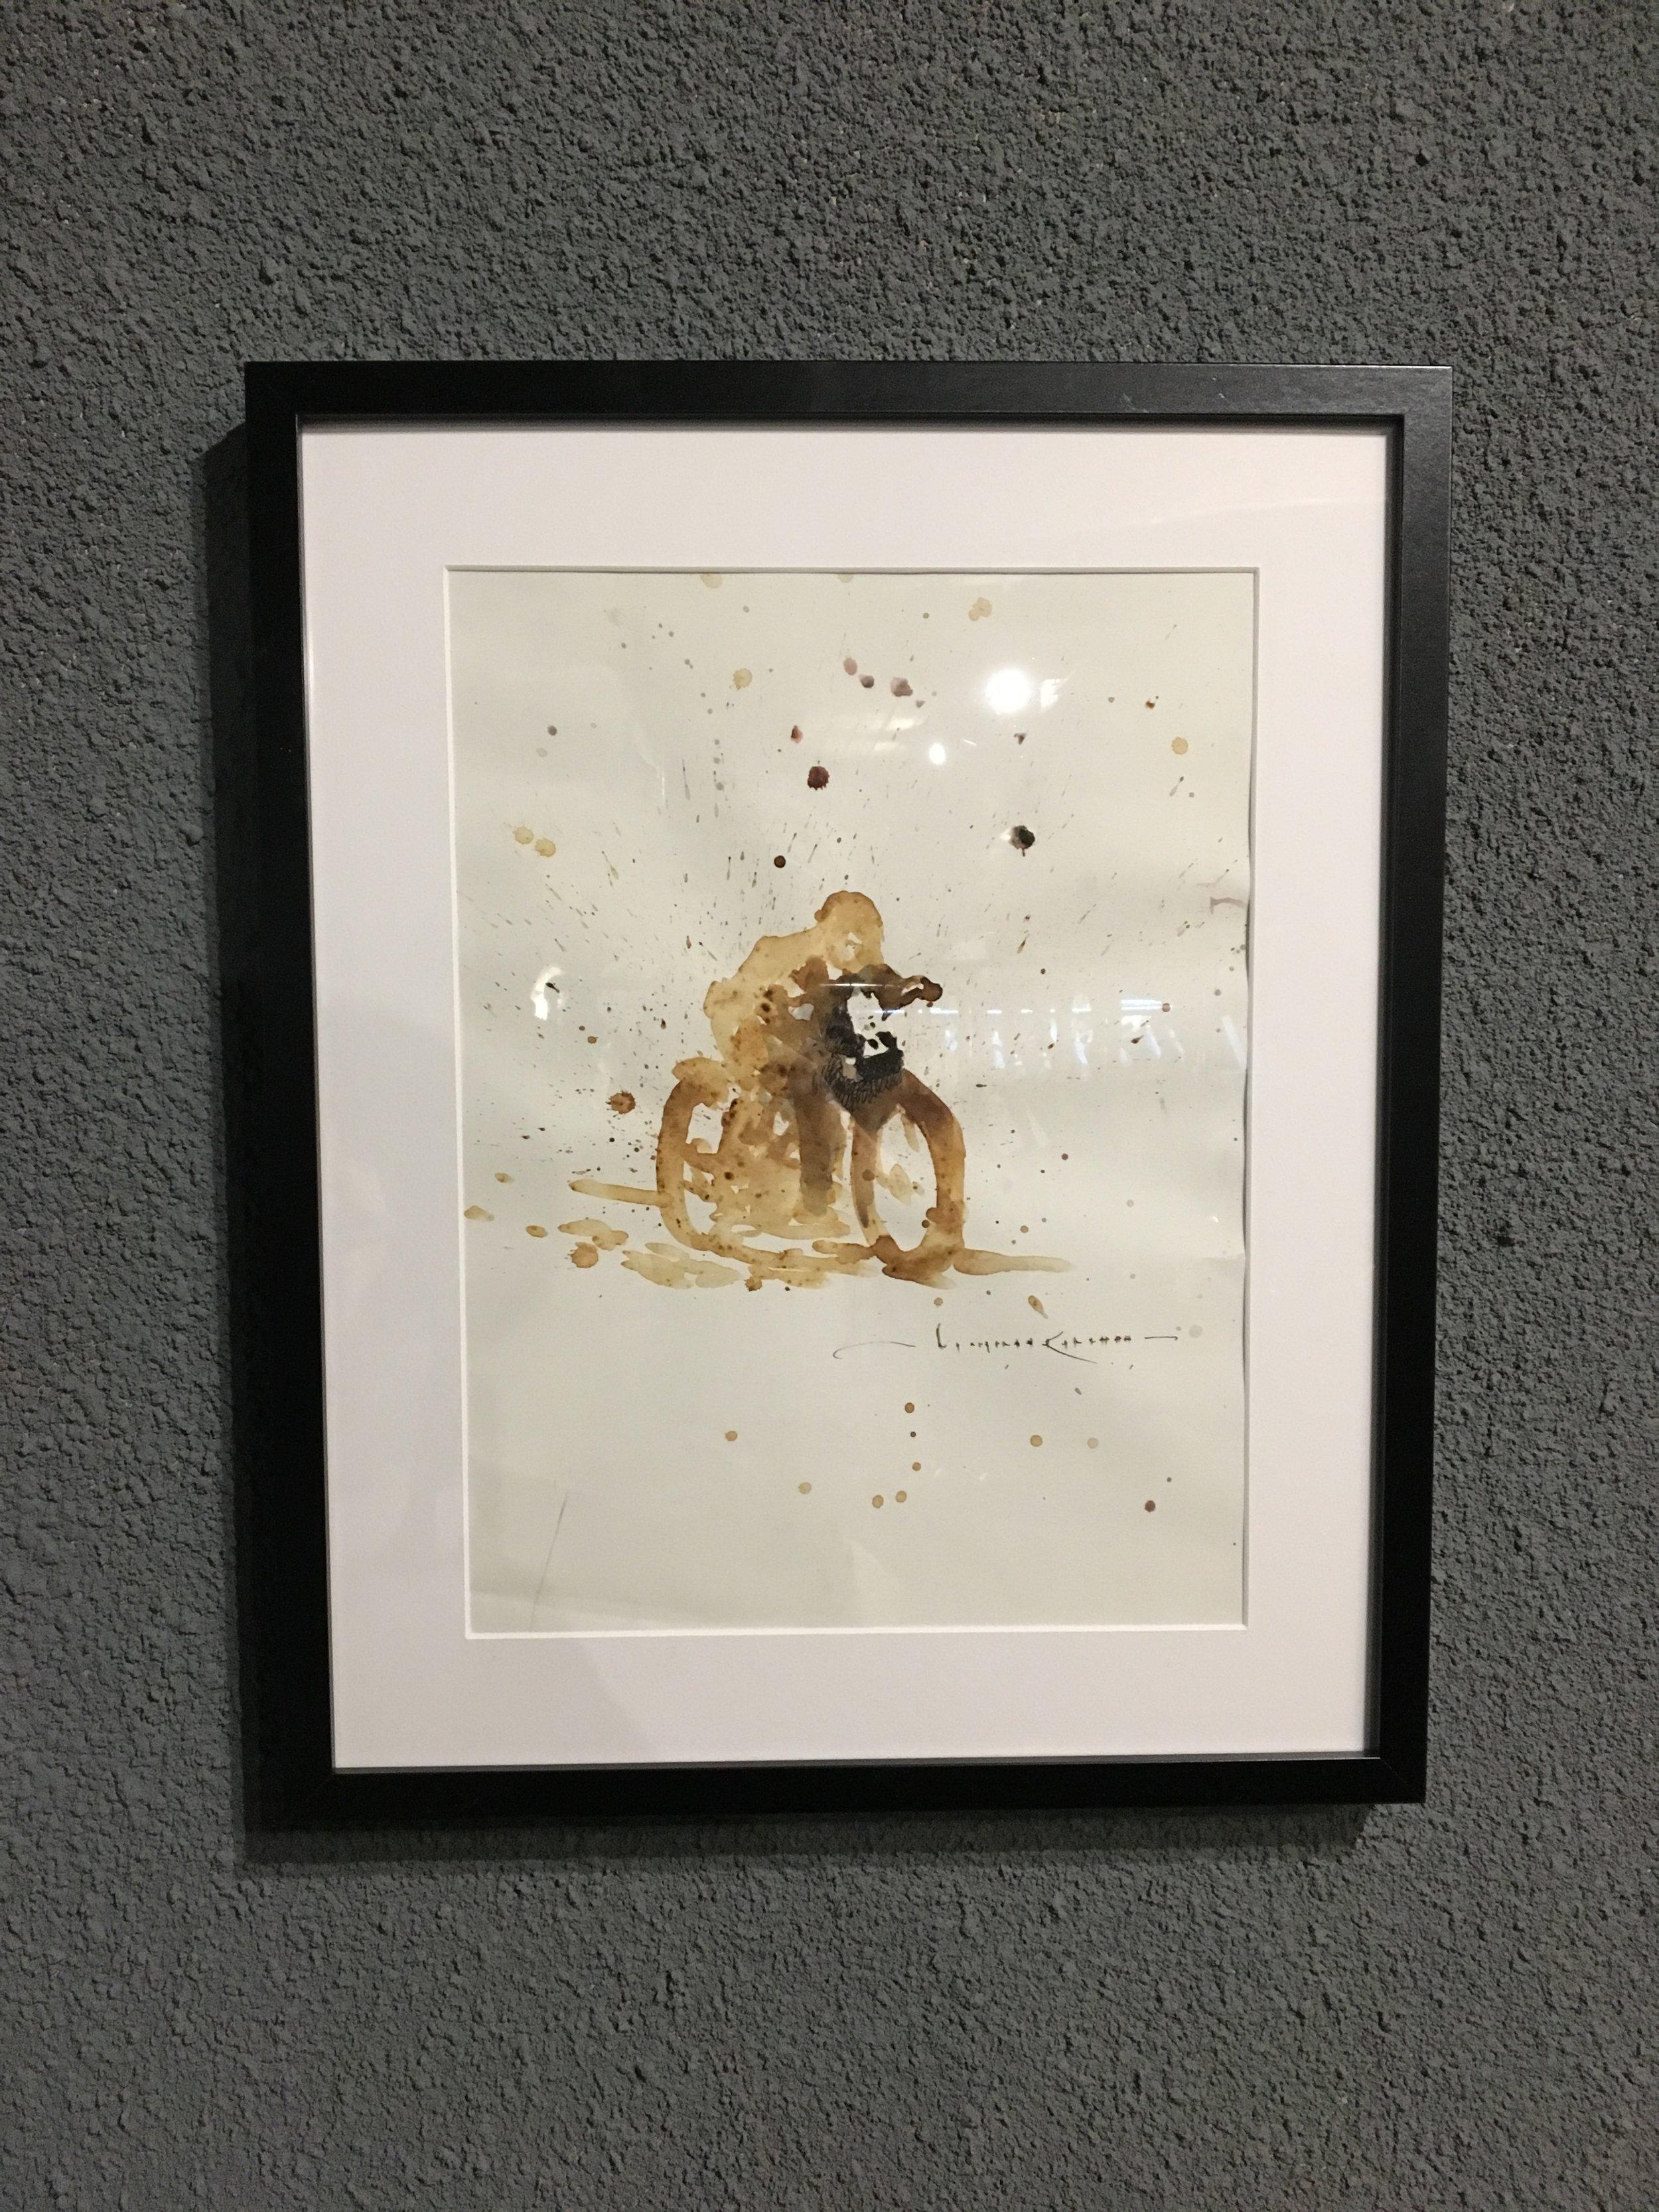 Casual snob - Nicholas Coleman Exhibition at Bolt 23.JPG